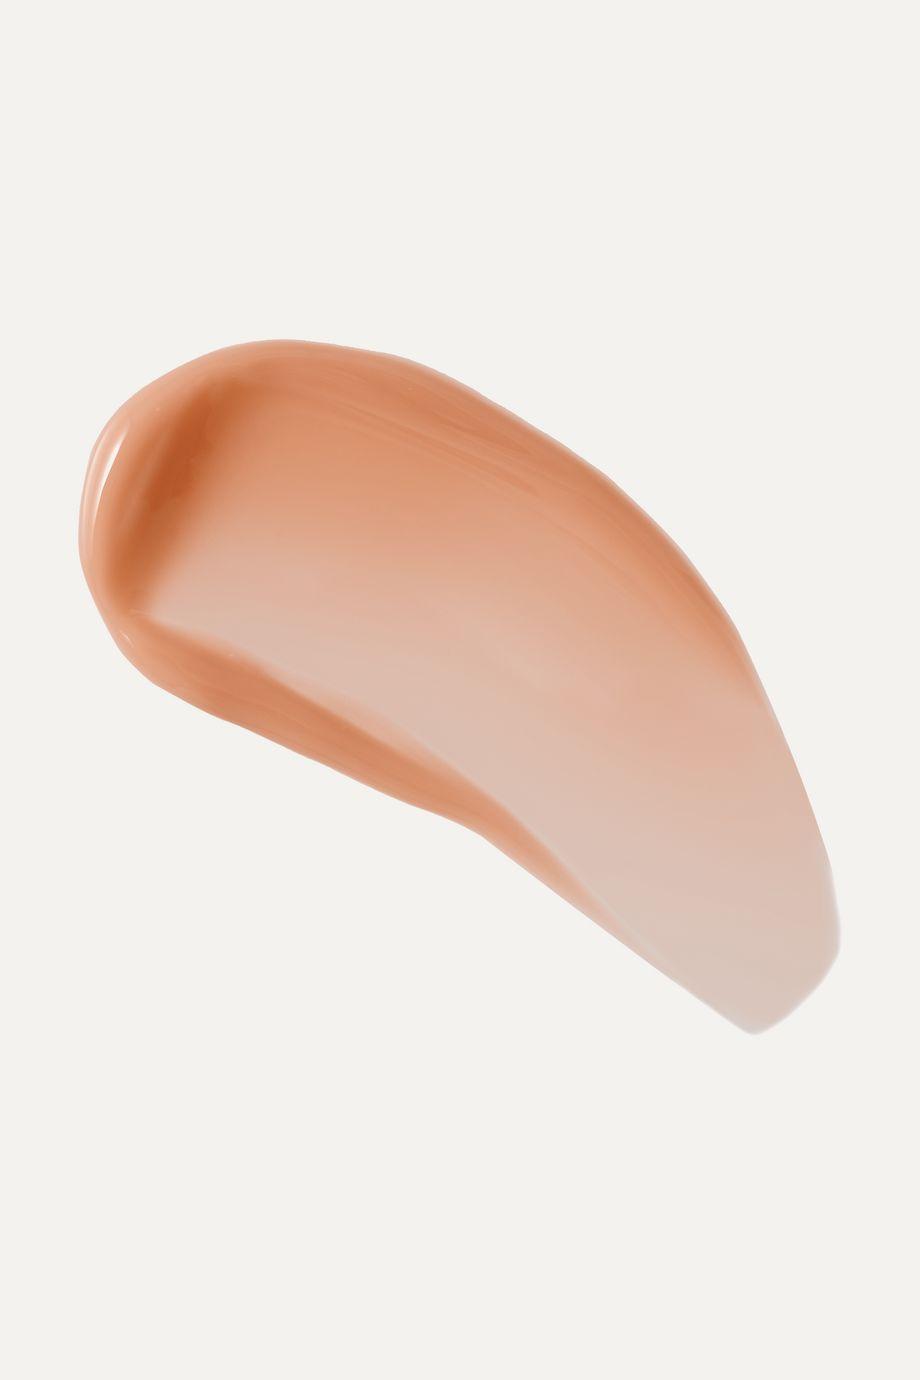 Avene Moisturizing Self-Tanning Silky Gel, 100ml